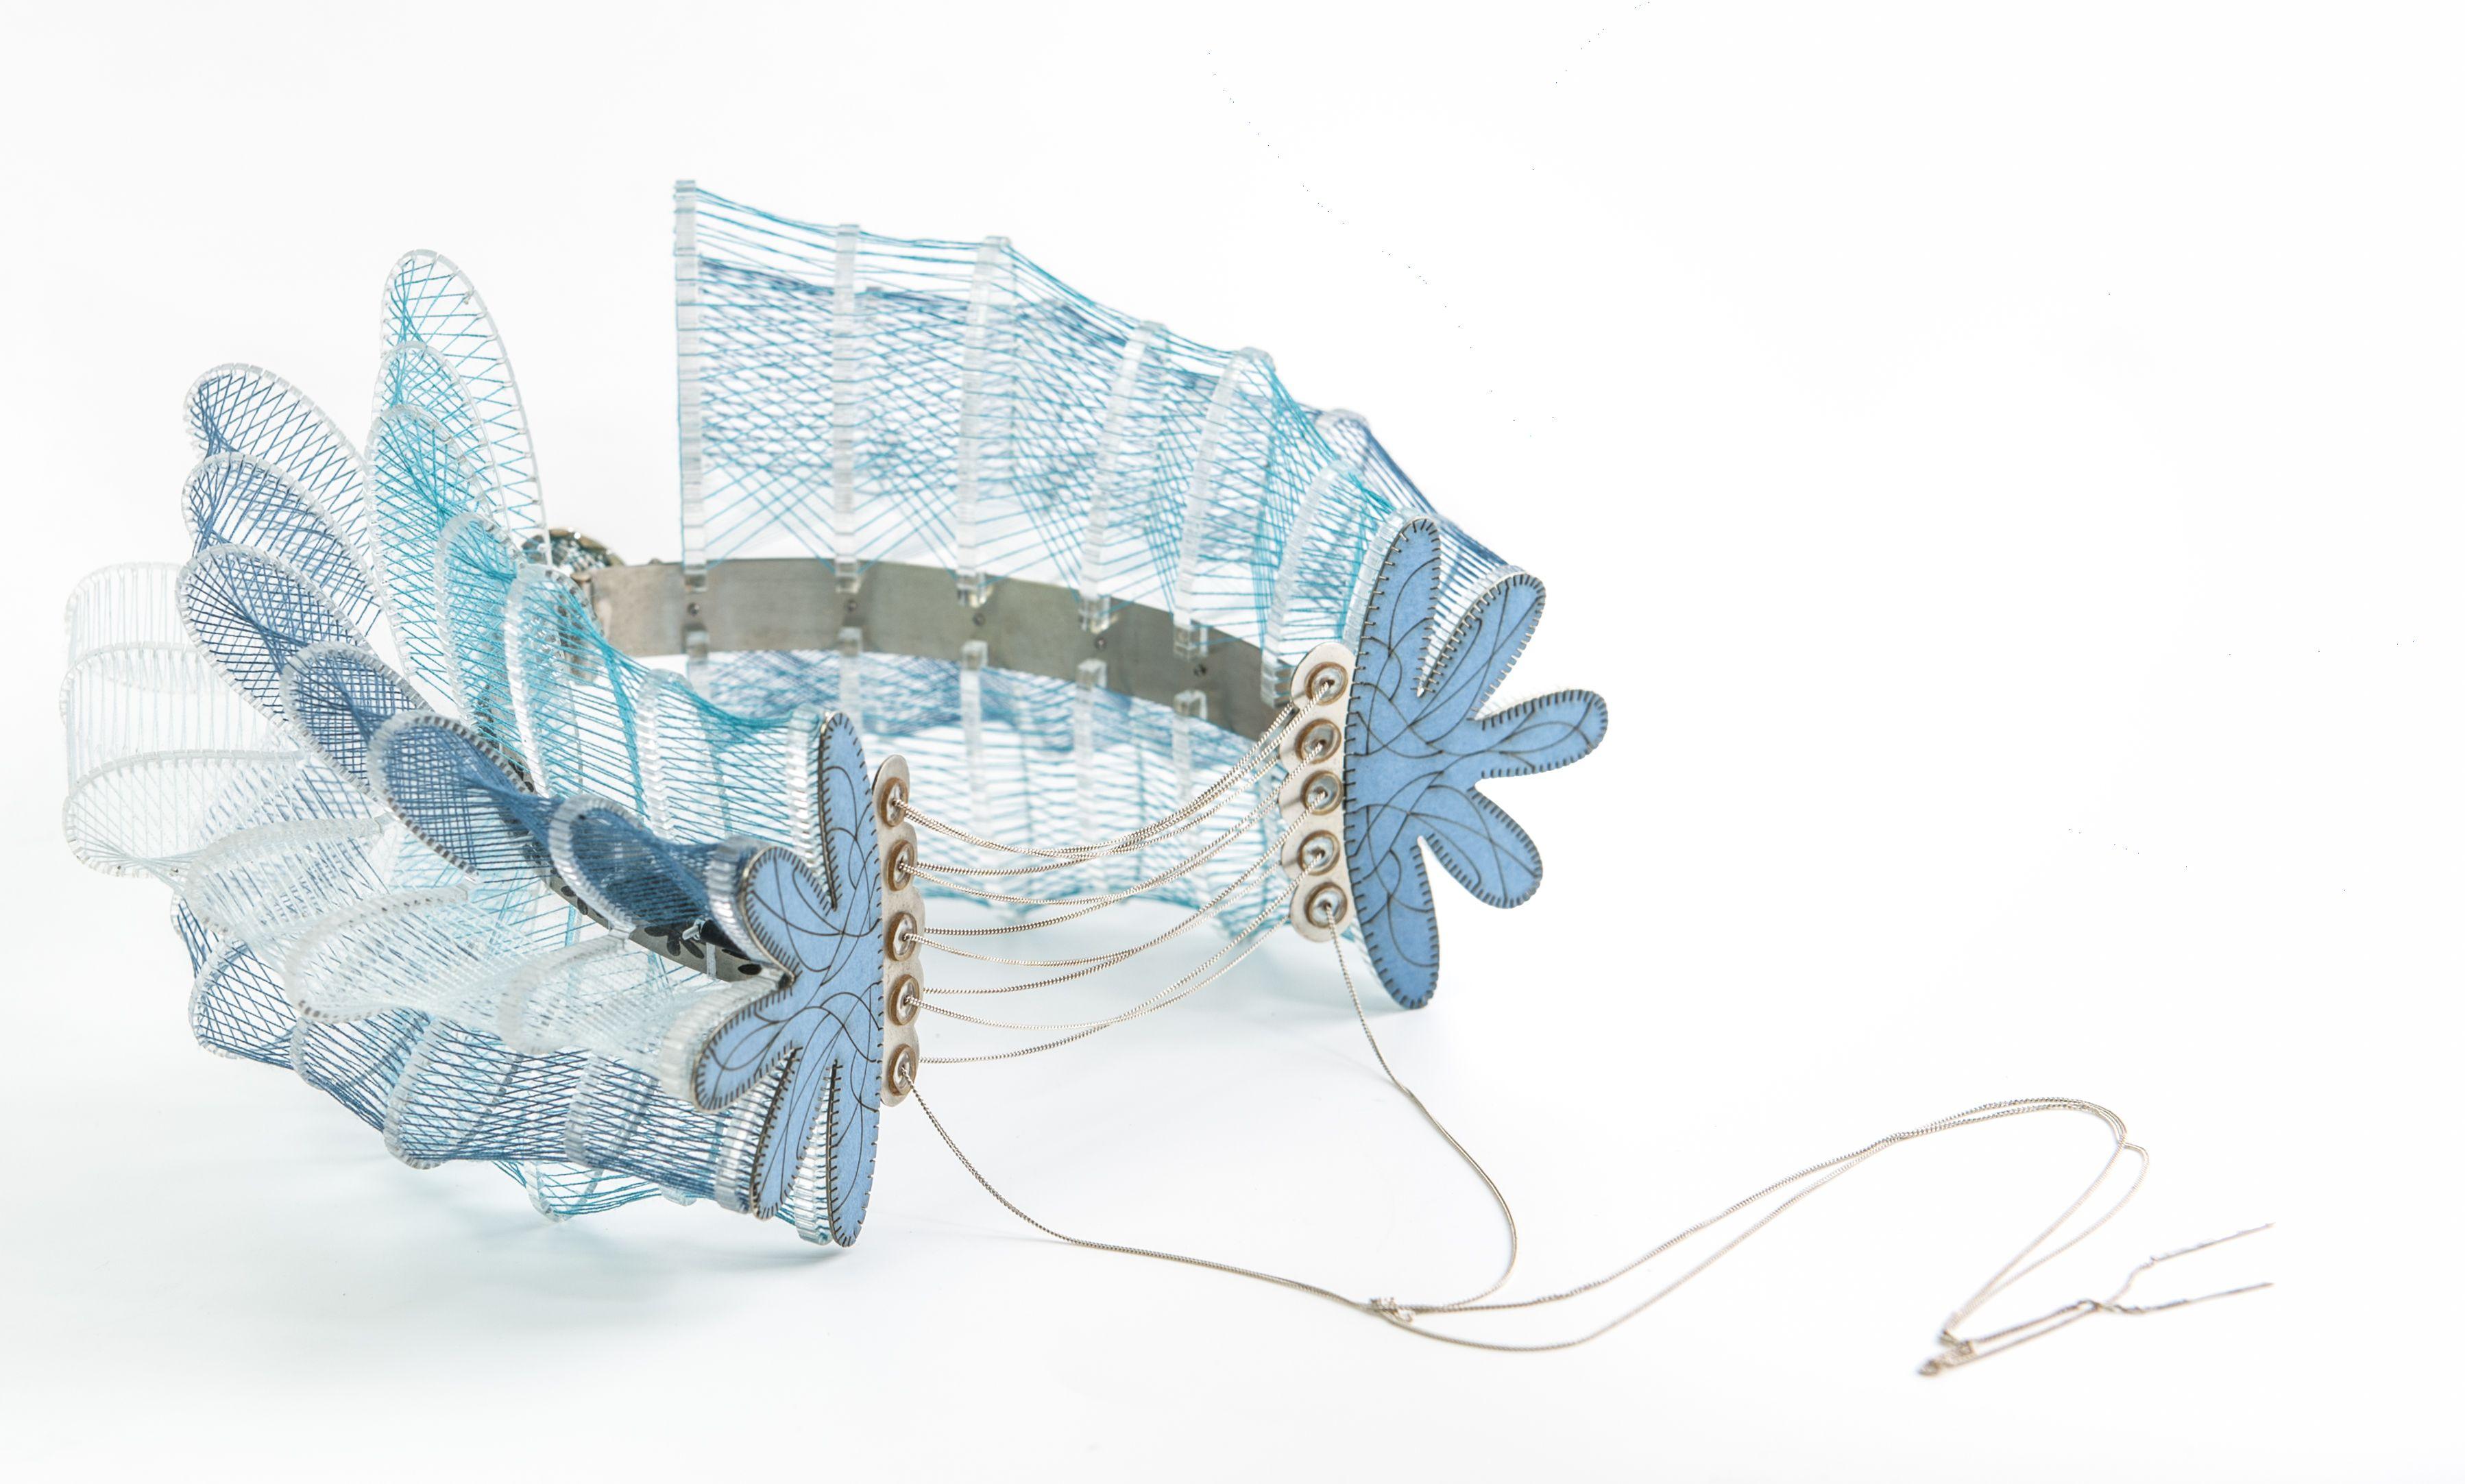 Neck-Sholder Jewelry Design by Dana Levy